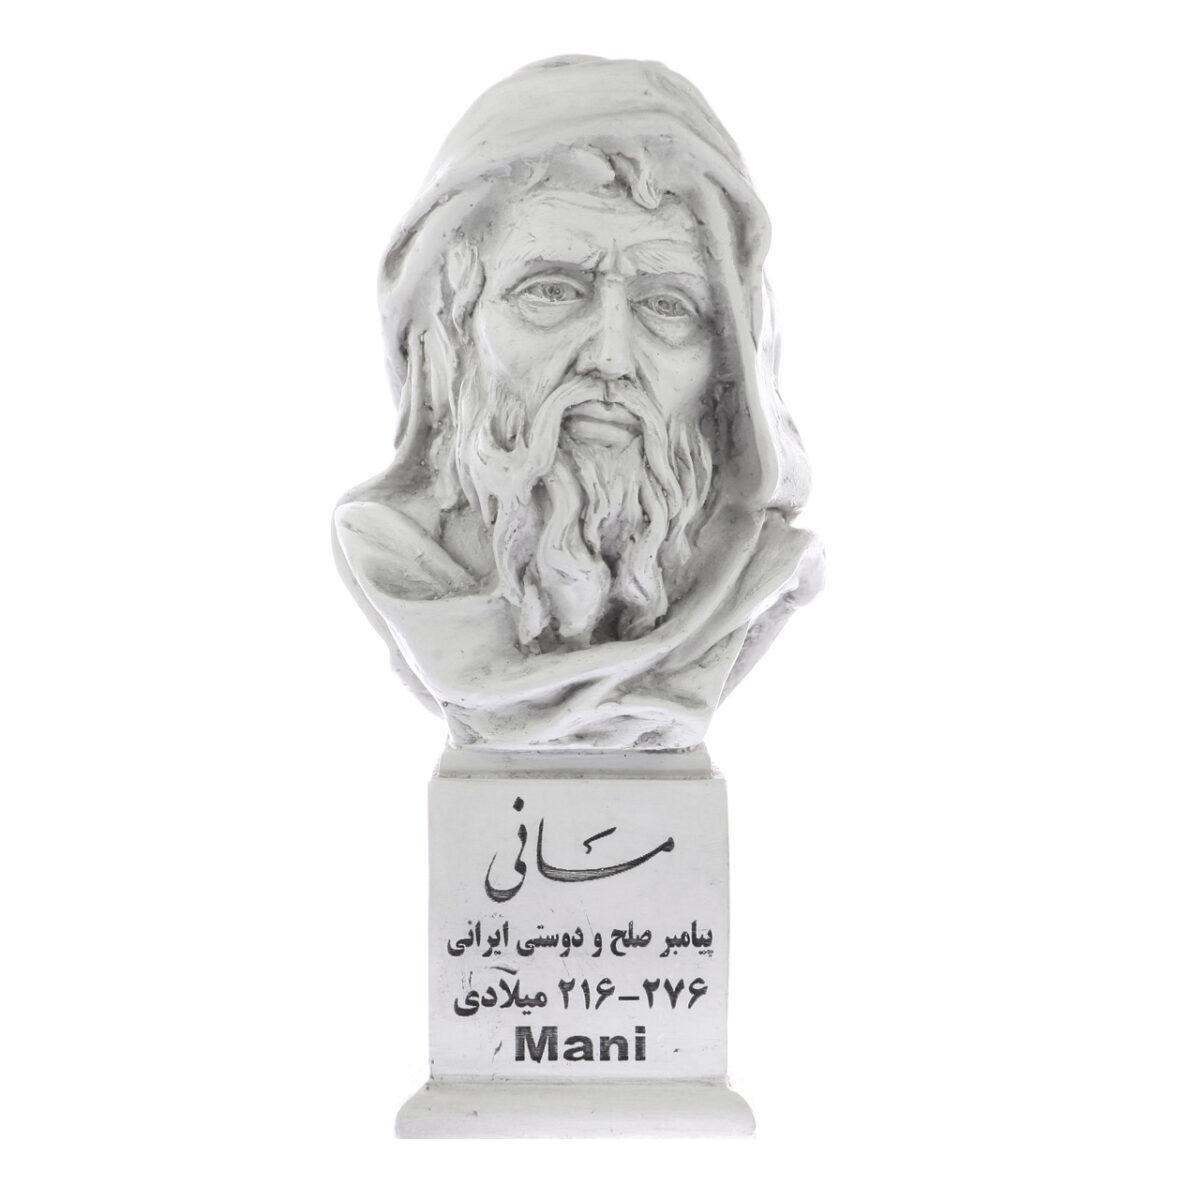 mani s 1200x1200 - سردیس مانی پیامبر